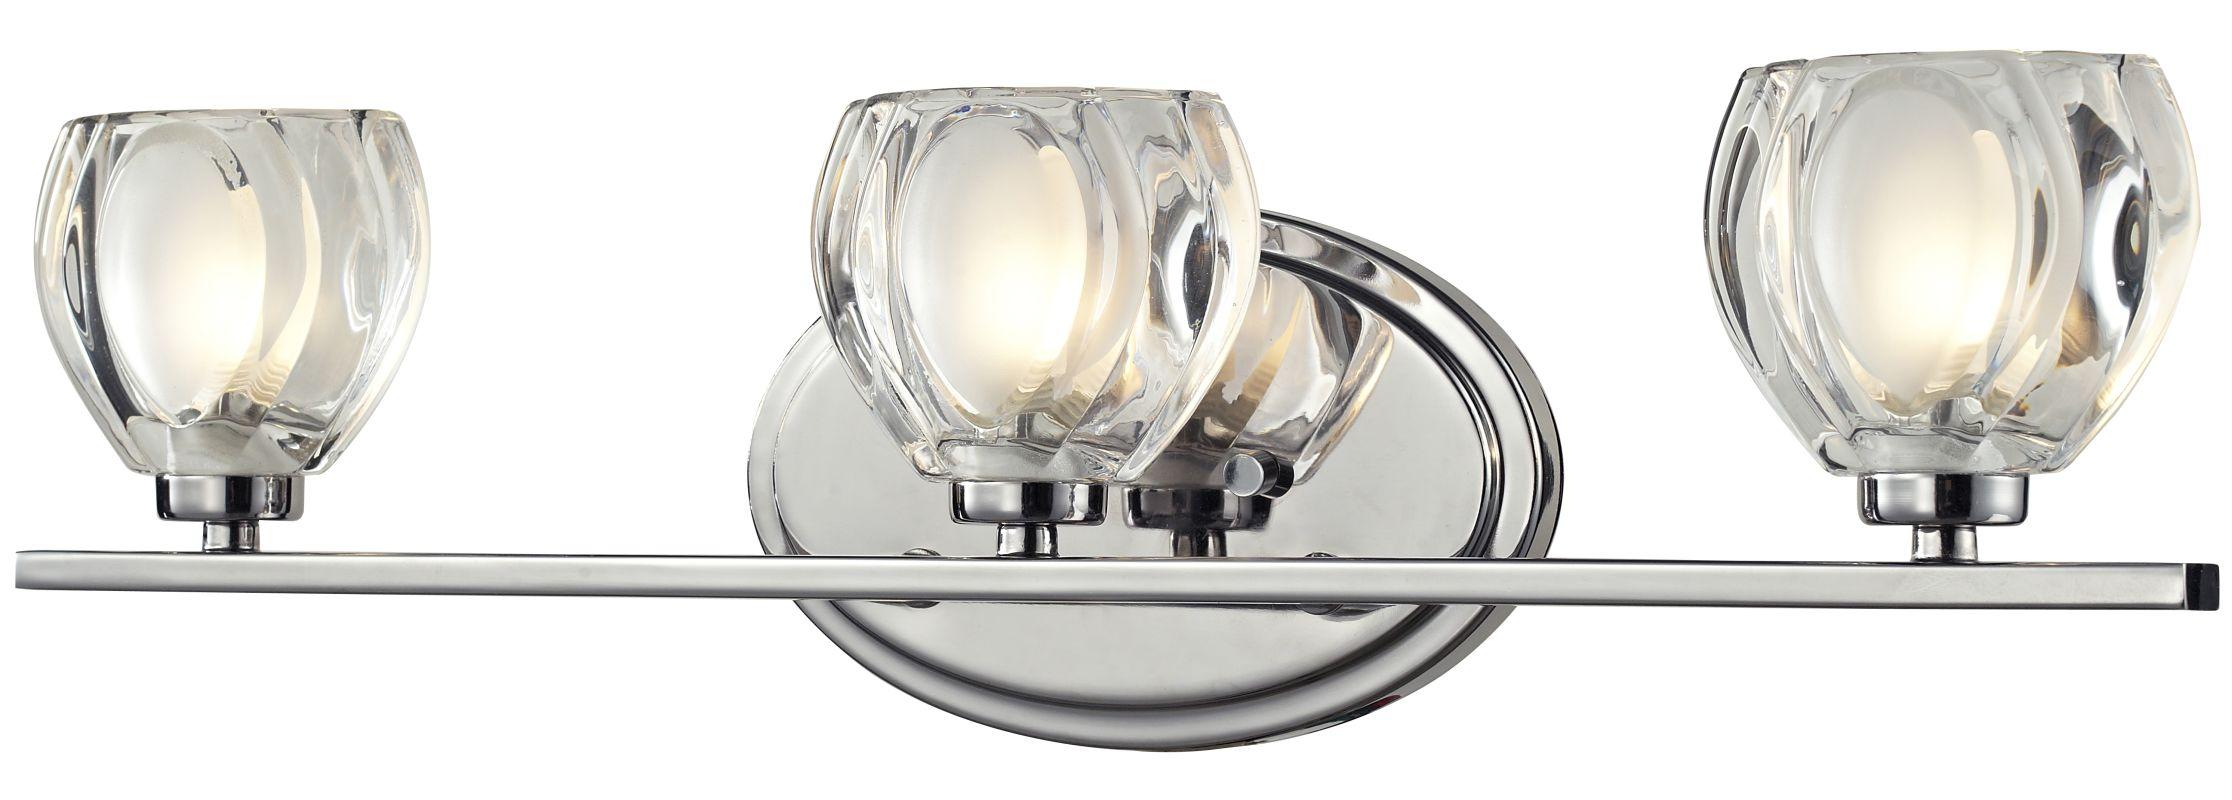 Z-Lite 3023-3V Hale 3 Light ADA Compliant Bathroom Vanity Light with